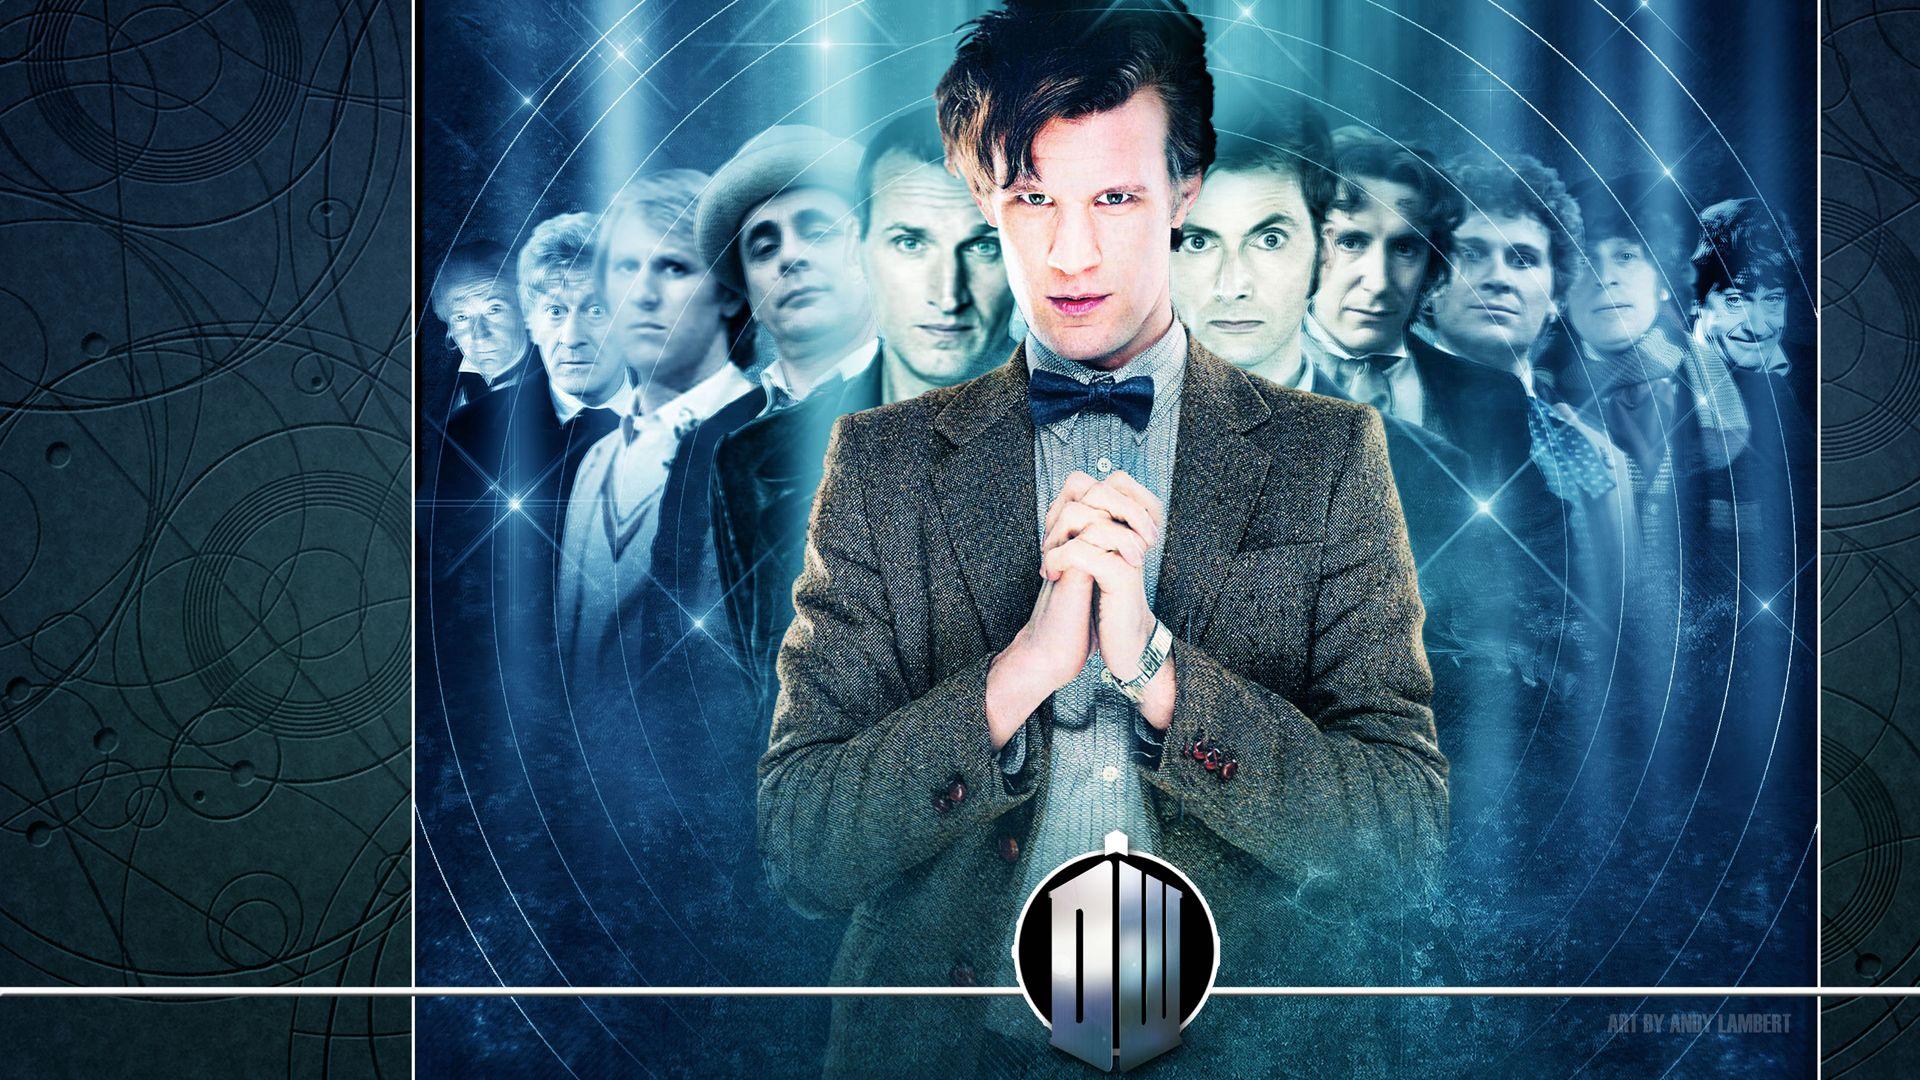 doctor who doctors | Matt Smith Doctors Eleventh Doctor Doctor Who Fresh New HD Wallpaper ...